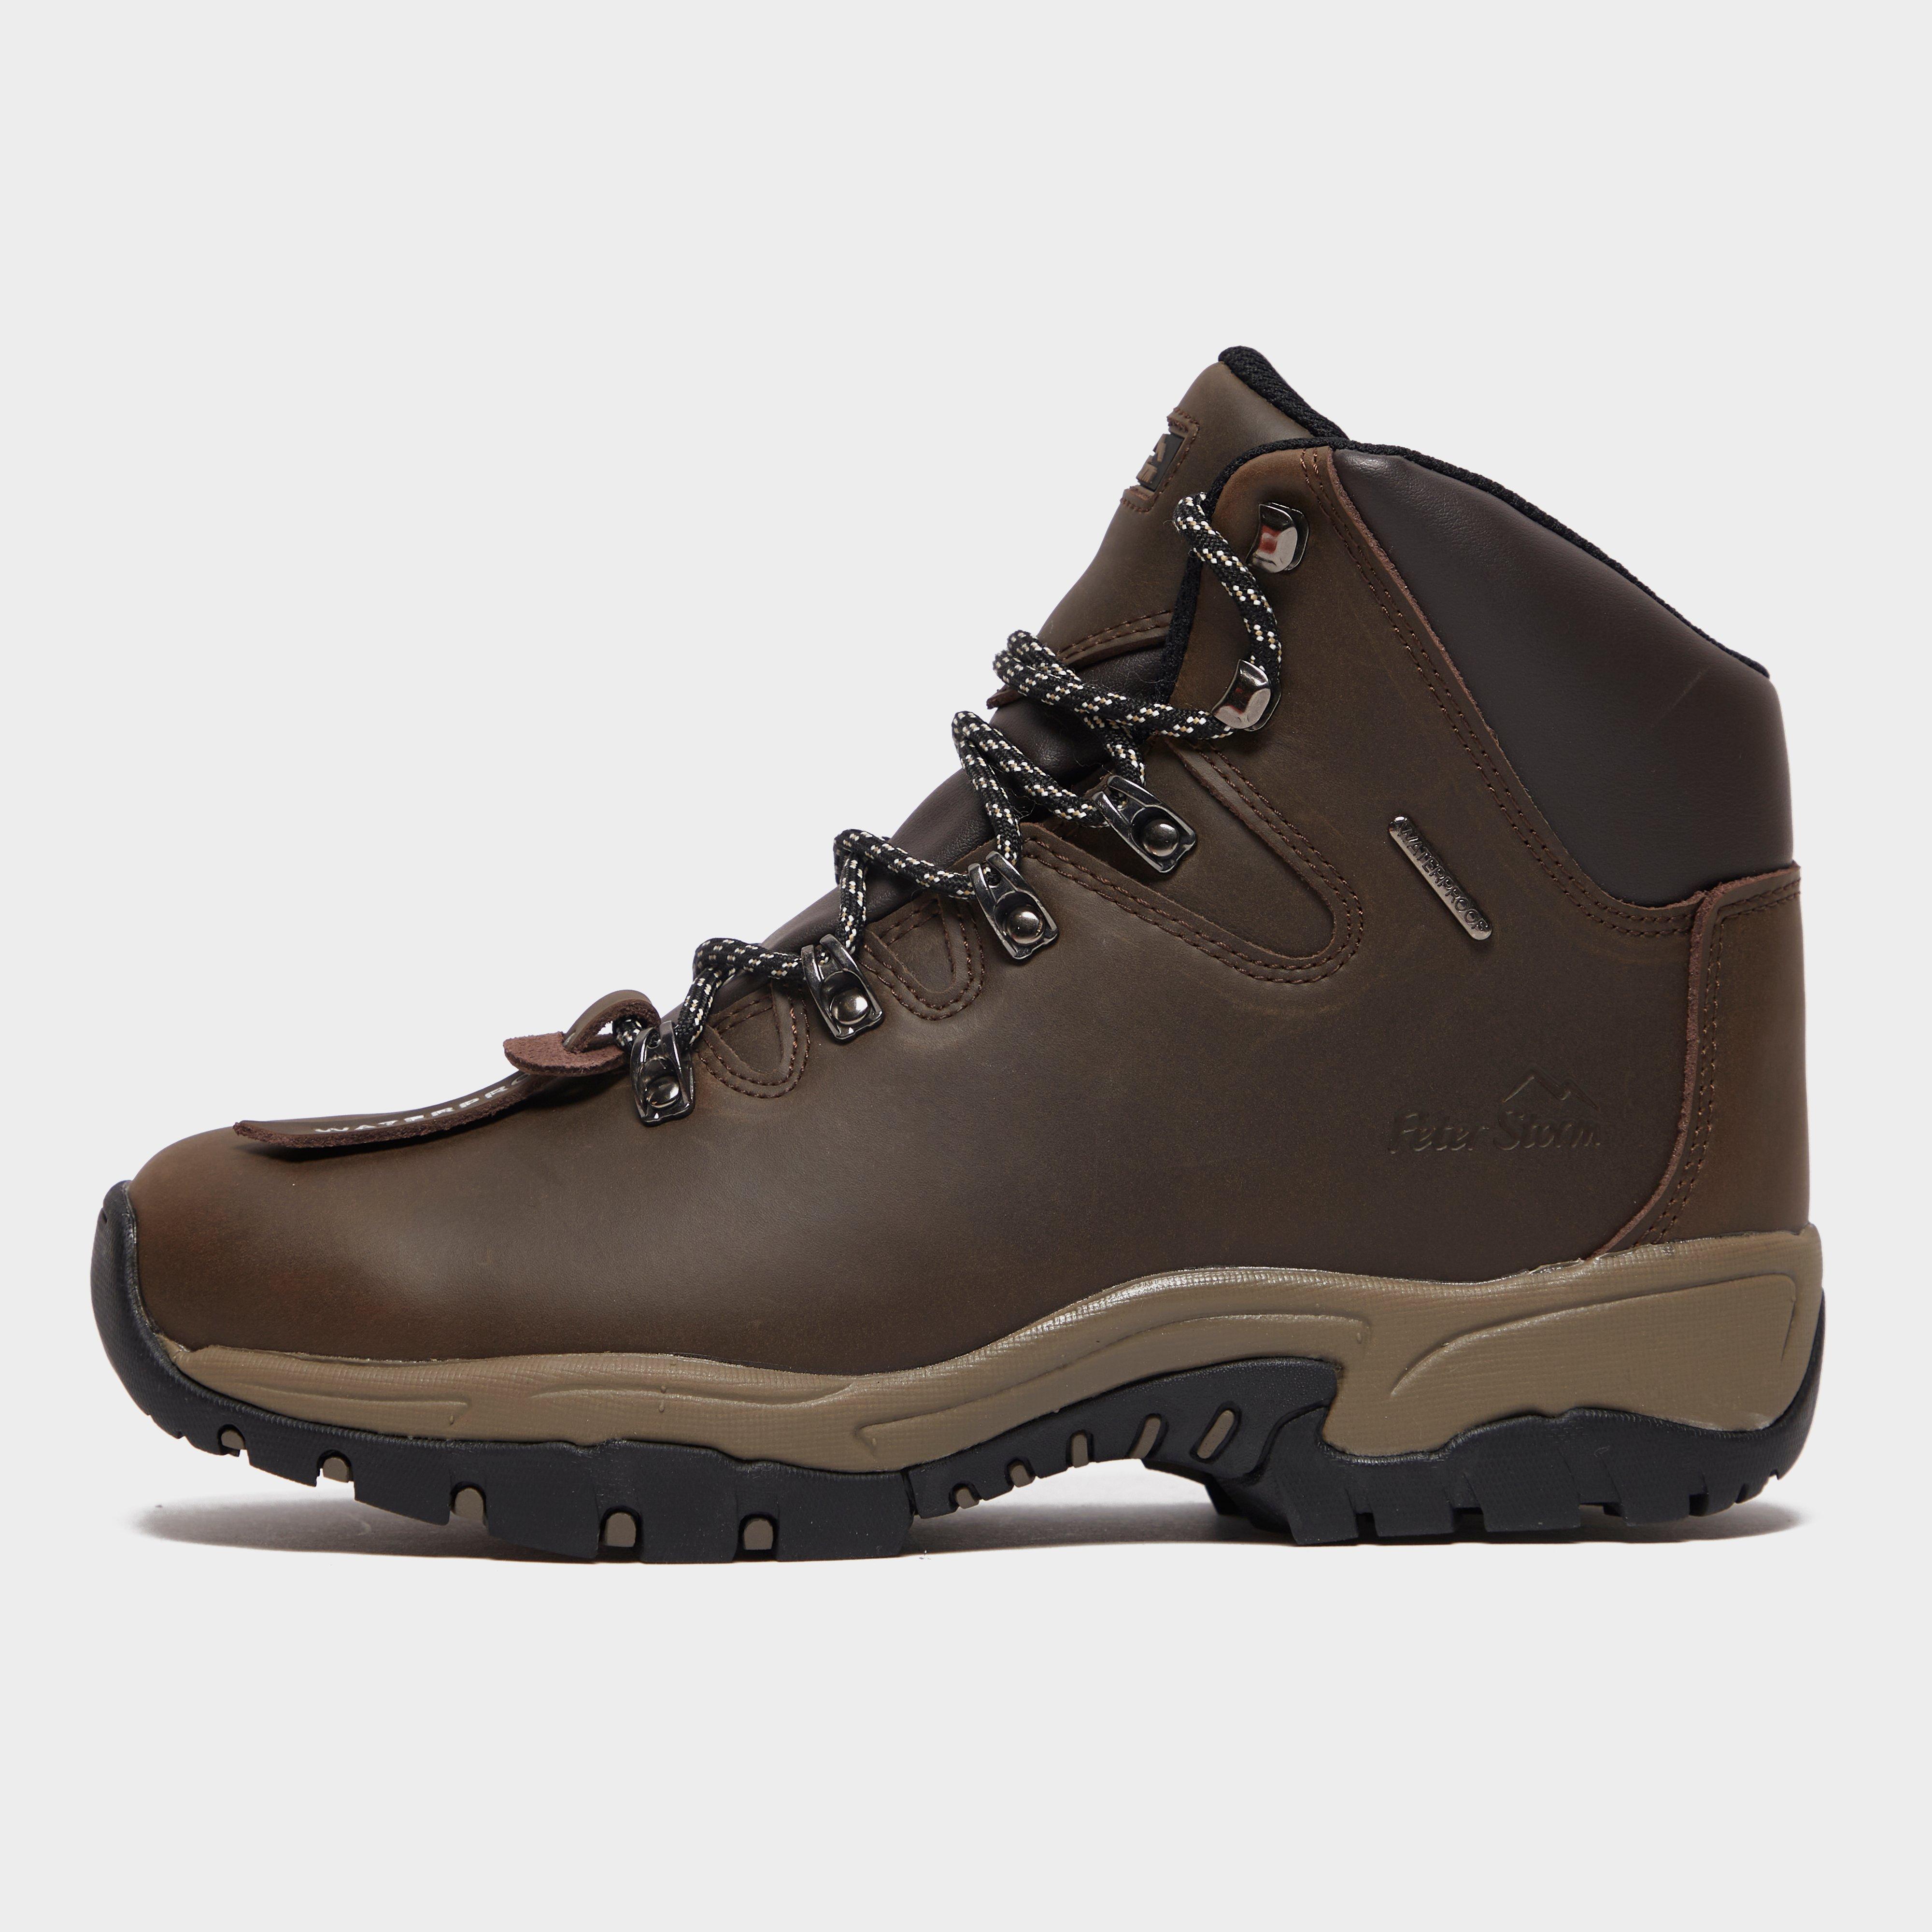 Peter Storm Kids' Snowdon Ii Walking Boots - Brown, Brown